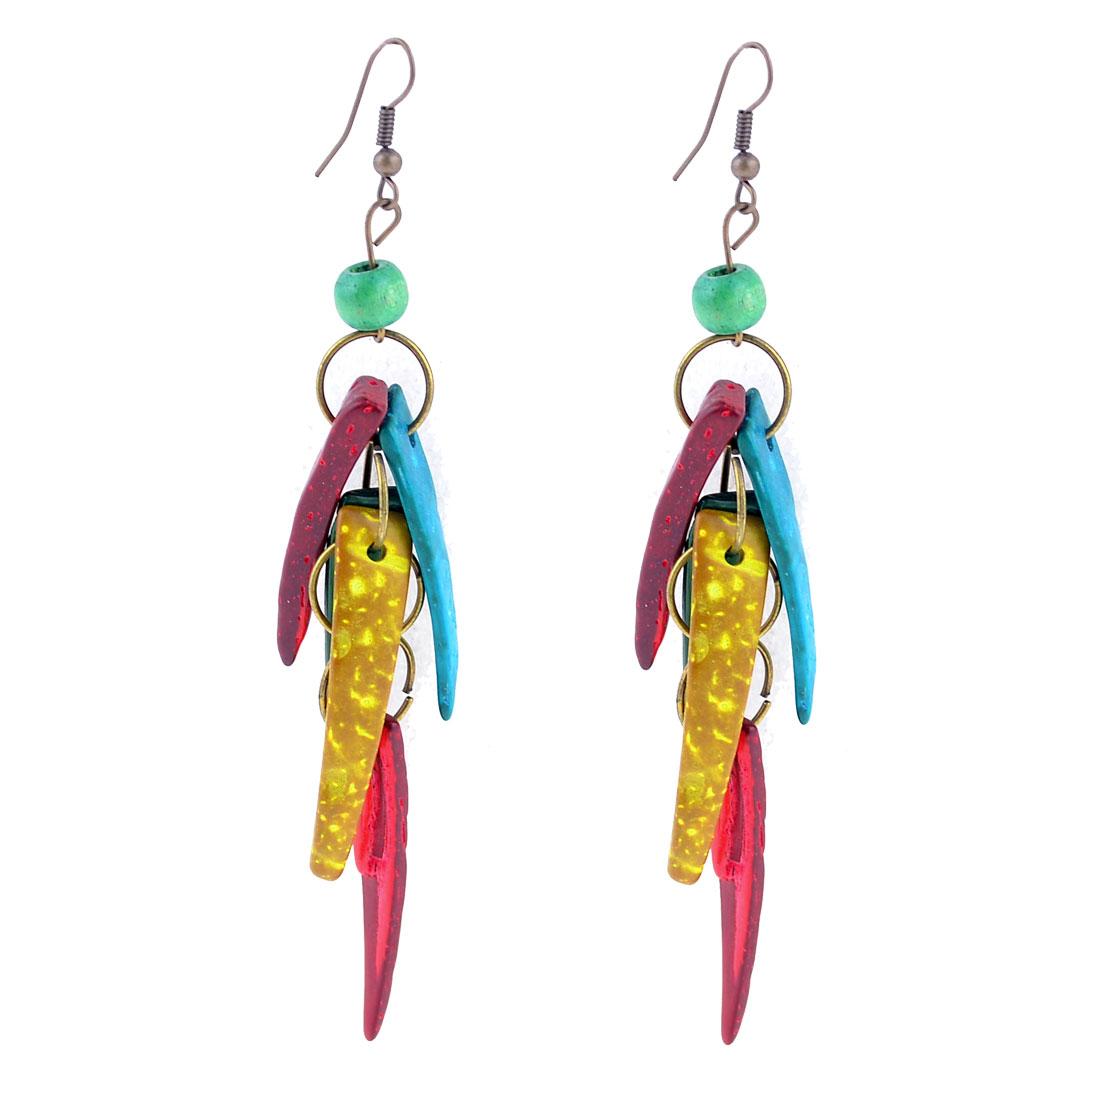 Woman Decor Colorful Dog Teeth Shape Pendant Dangling Ear Hook Earrings Pair